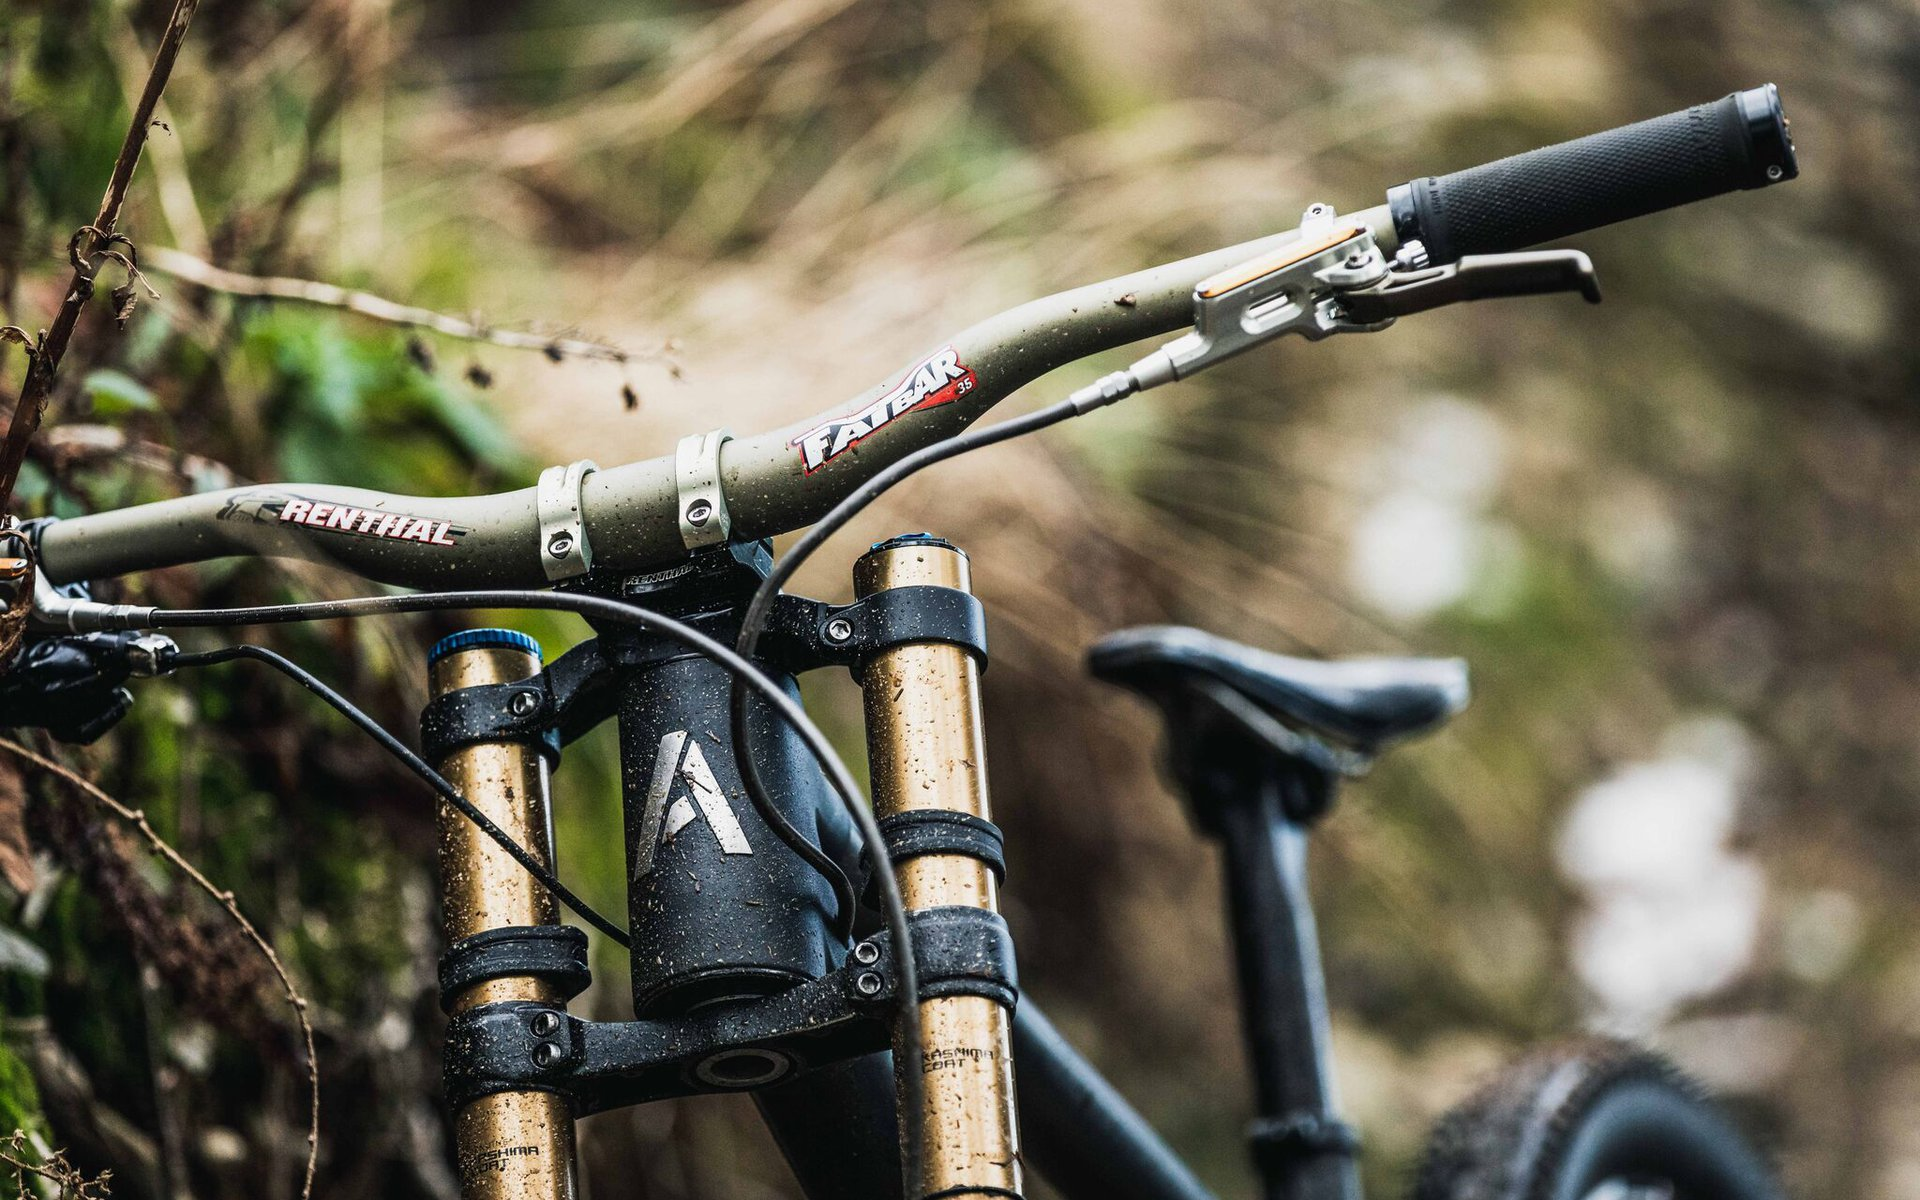 4961093f372 Press Release. Athertons Reveal Their Own Bike Brand. Words Atherton Bikes